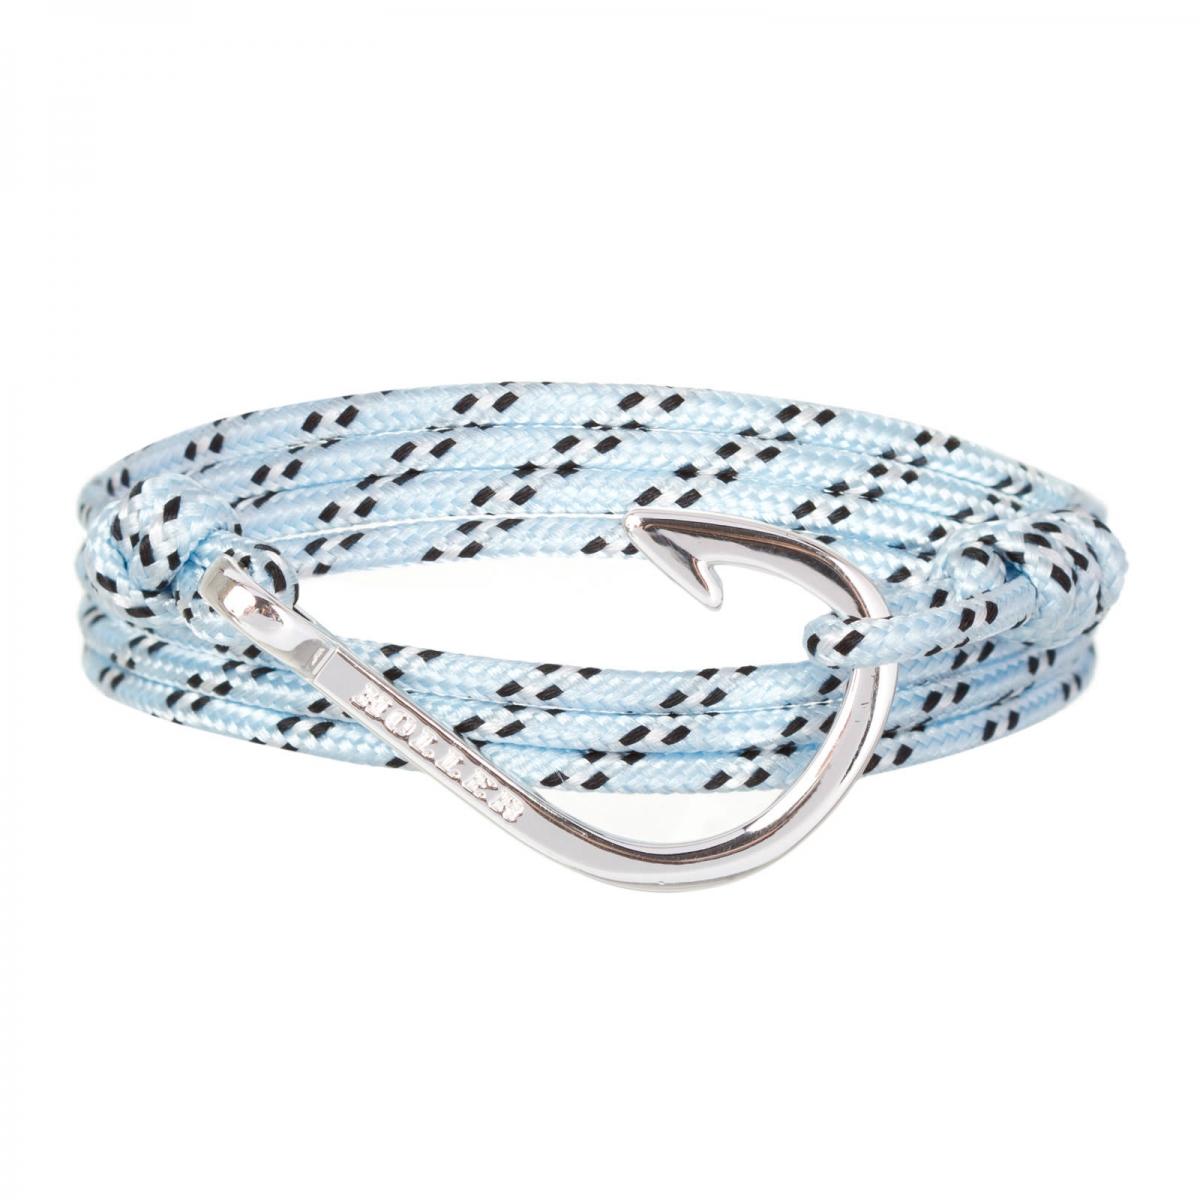 Kirby  Silver Polished Hook / Light Blue, Black and White Paracord Bracelet